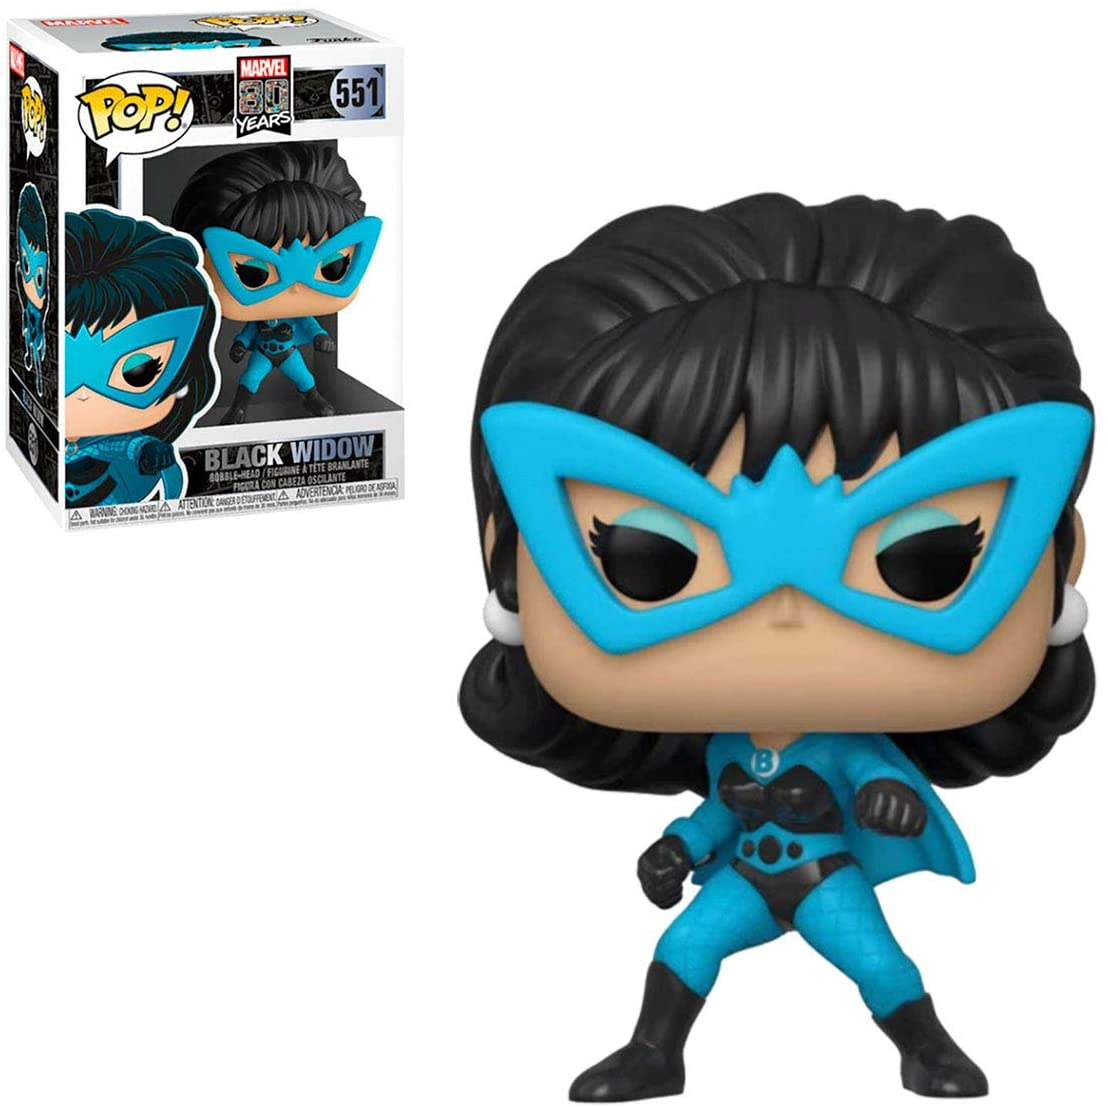 Funko Pop Black Widow First Appearance 551 Marvel 80 Years